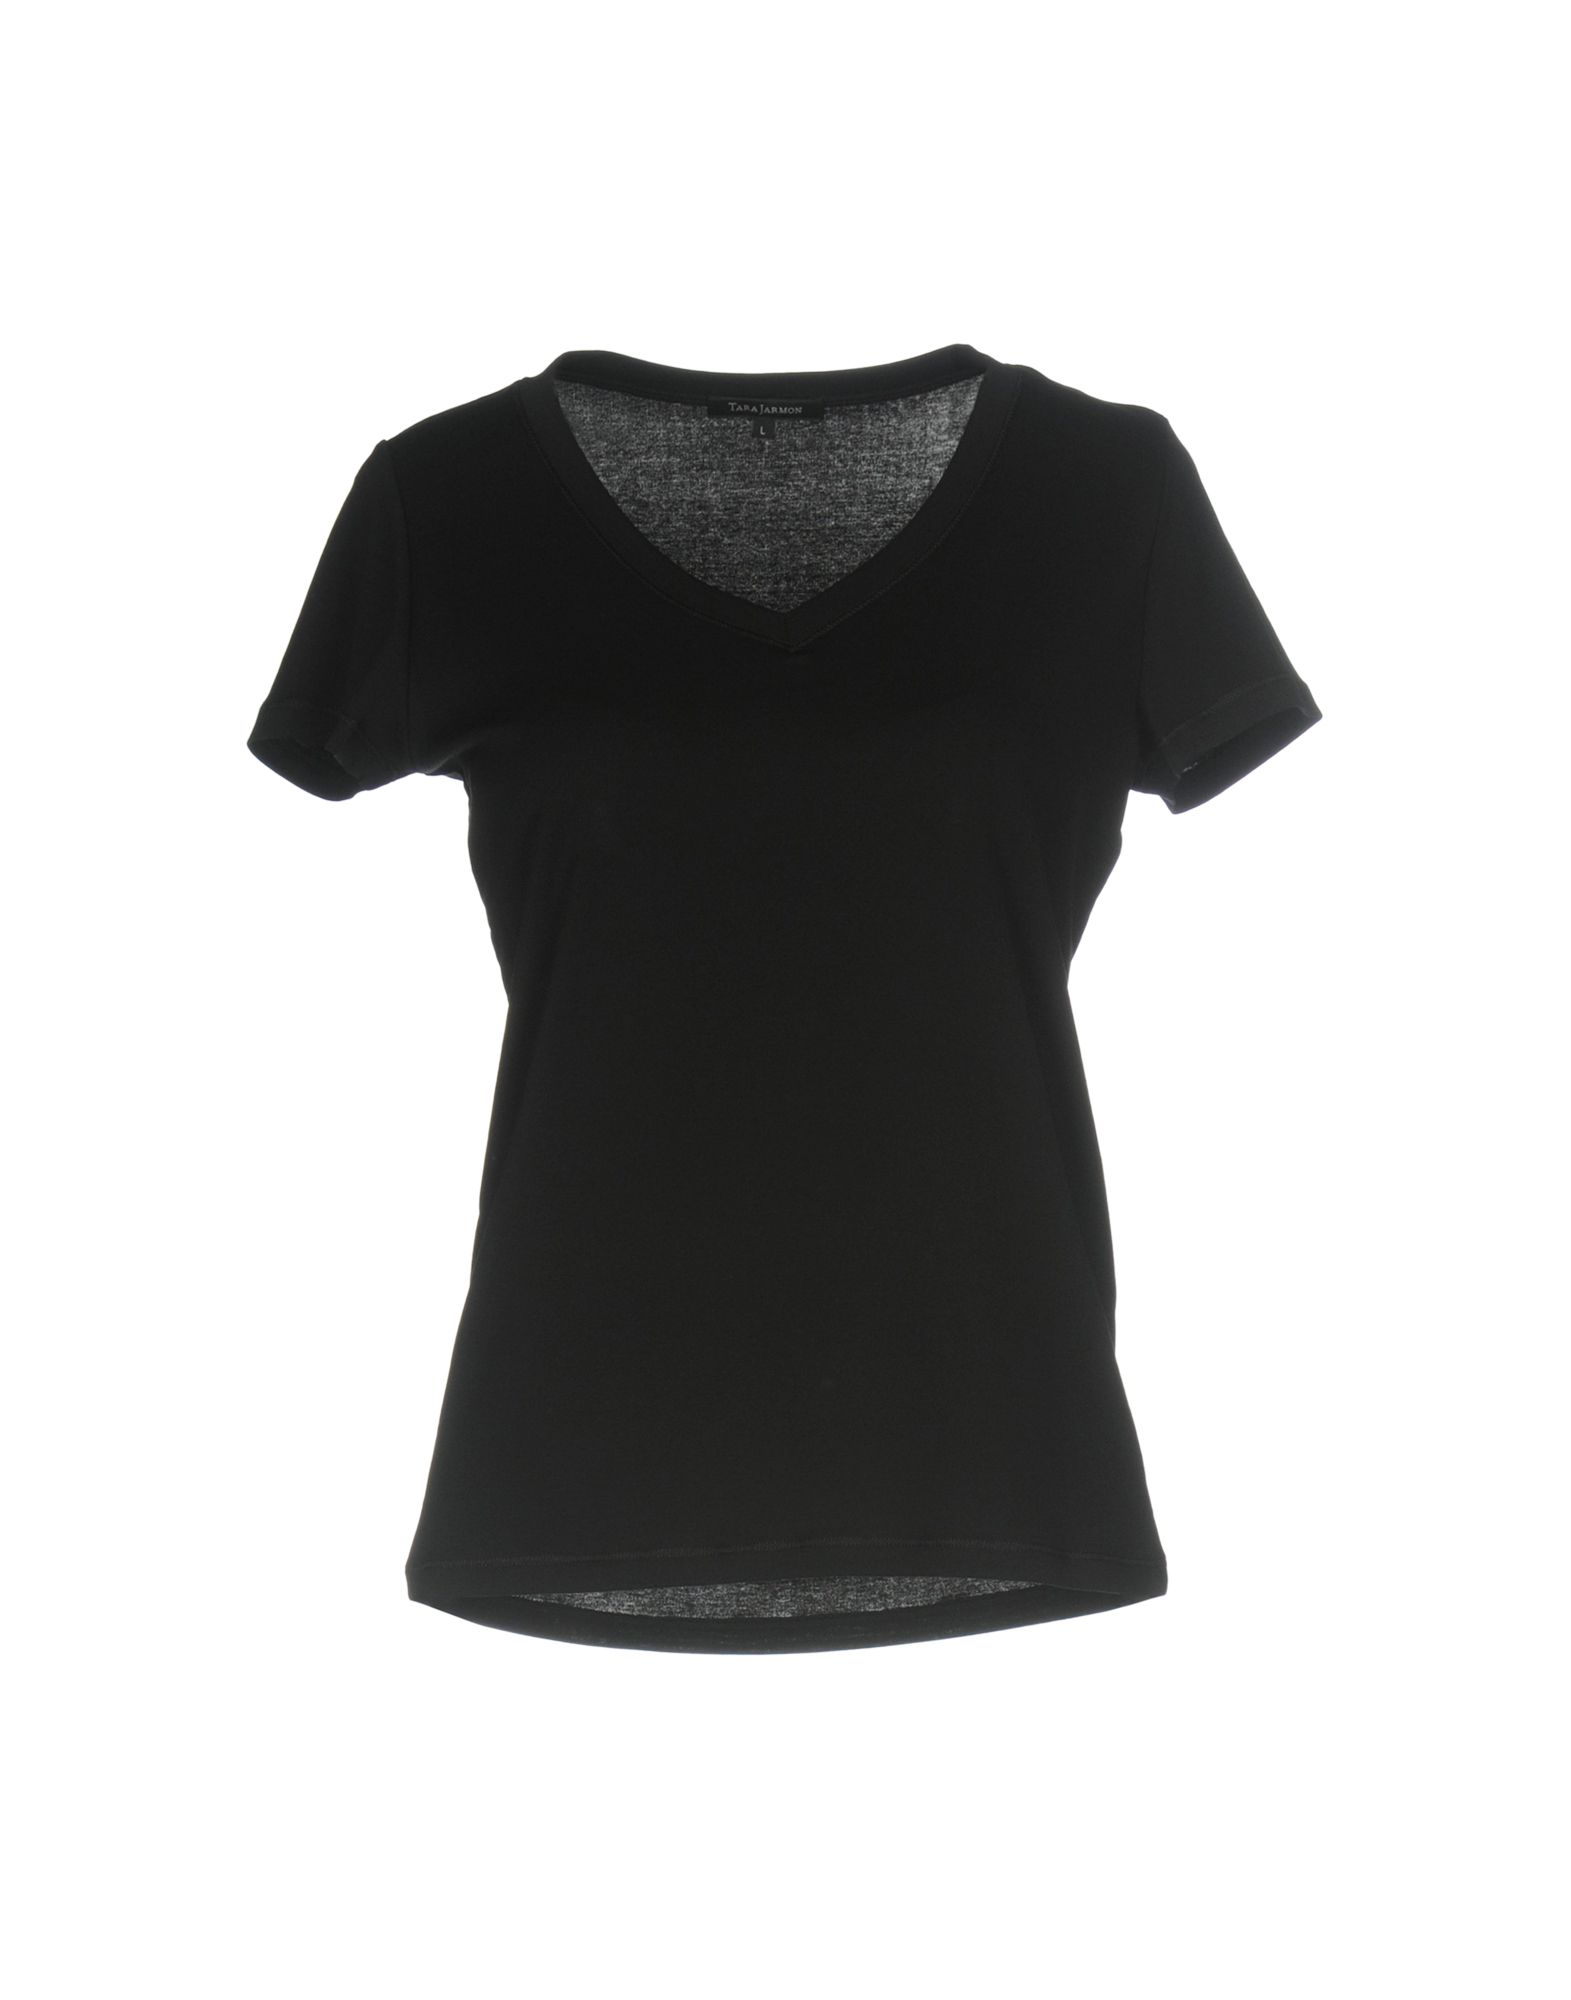 Jarmon Ligne Femme De TaraAchat En T shirt nO0kPw